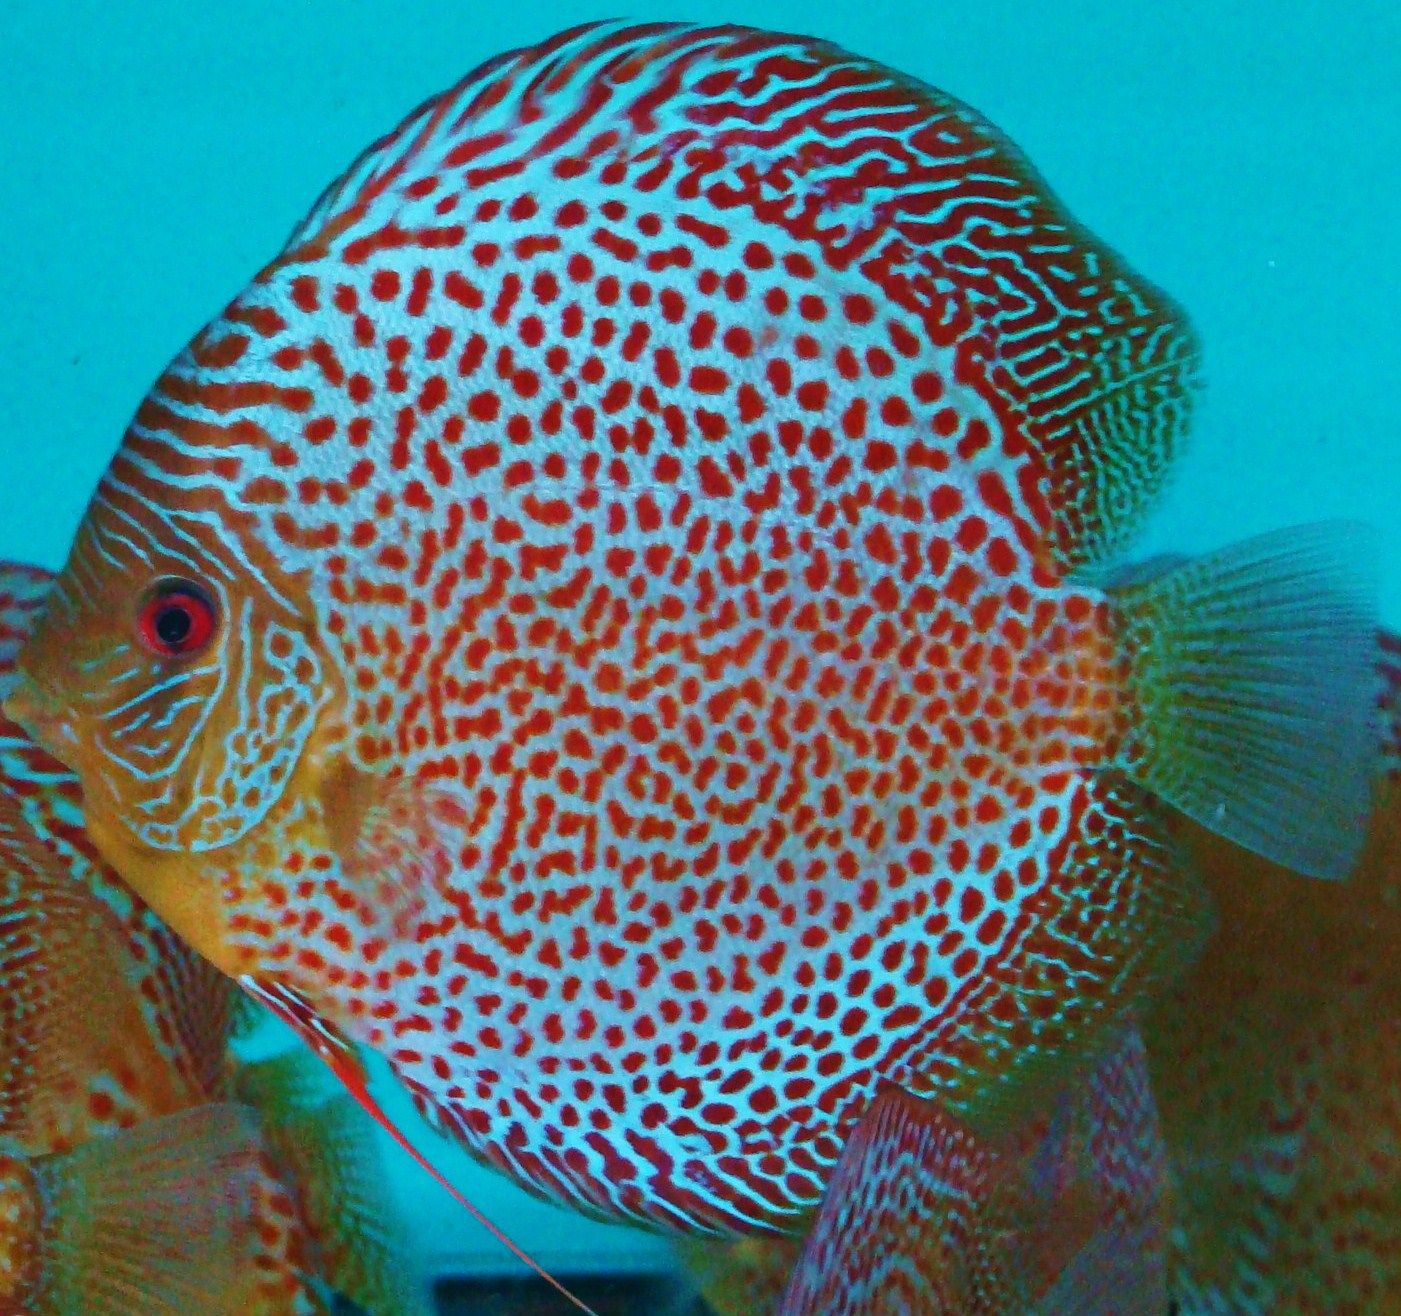 Snakeskin Discus Fish Discus Fish Freshwater Fish Tropical Freshwater Fish